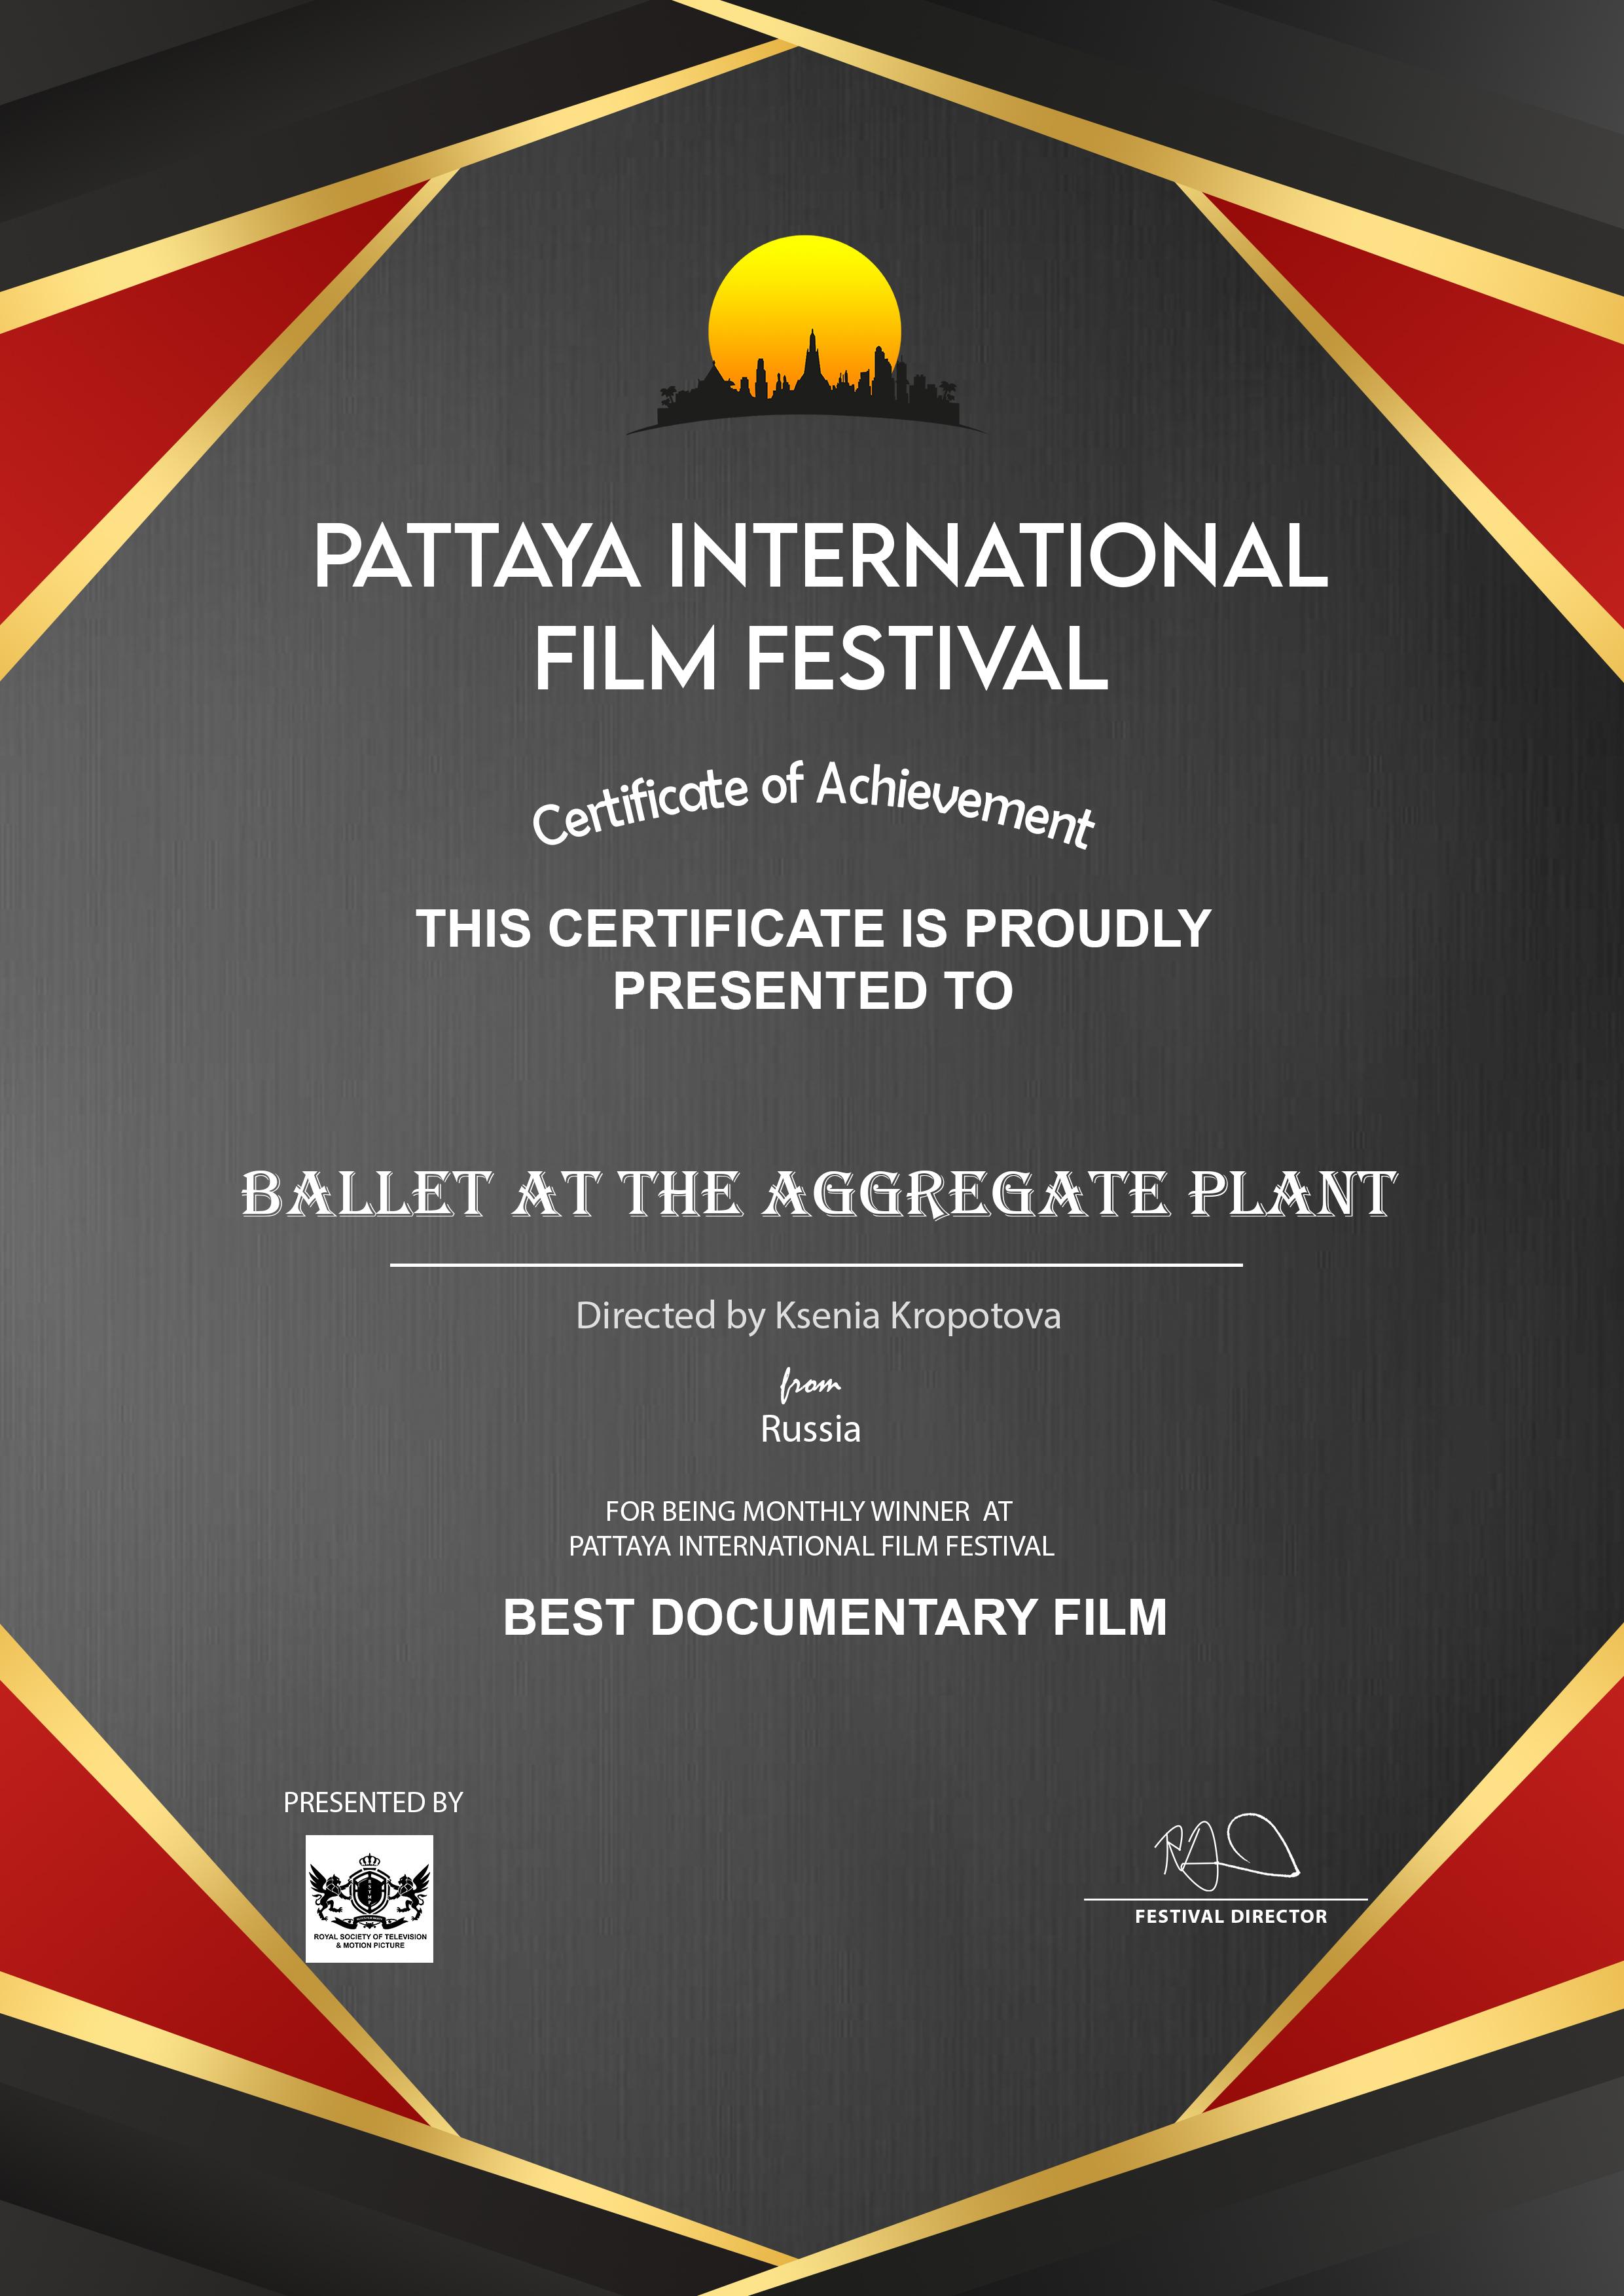 Pattaya International Film Festival